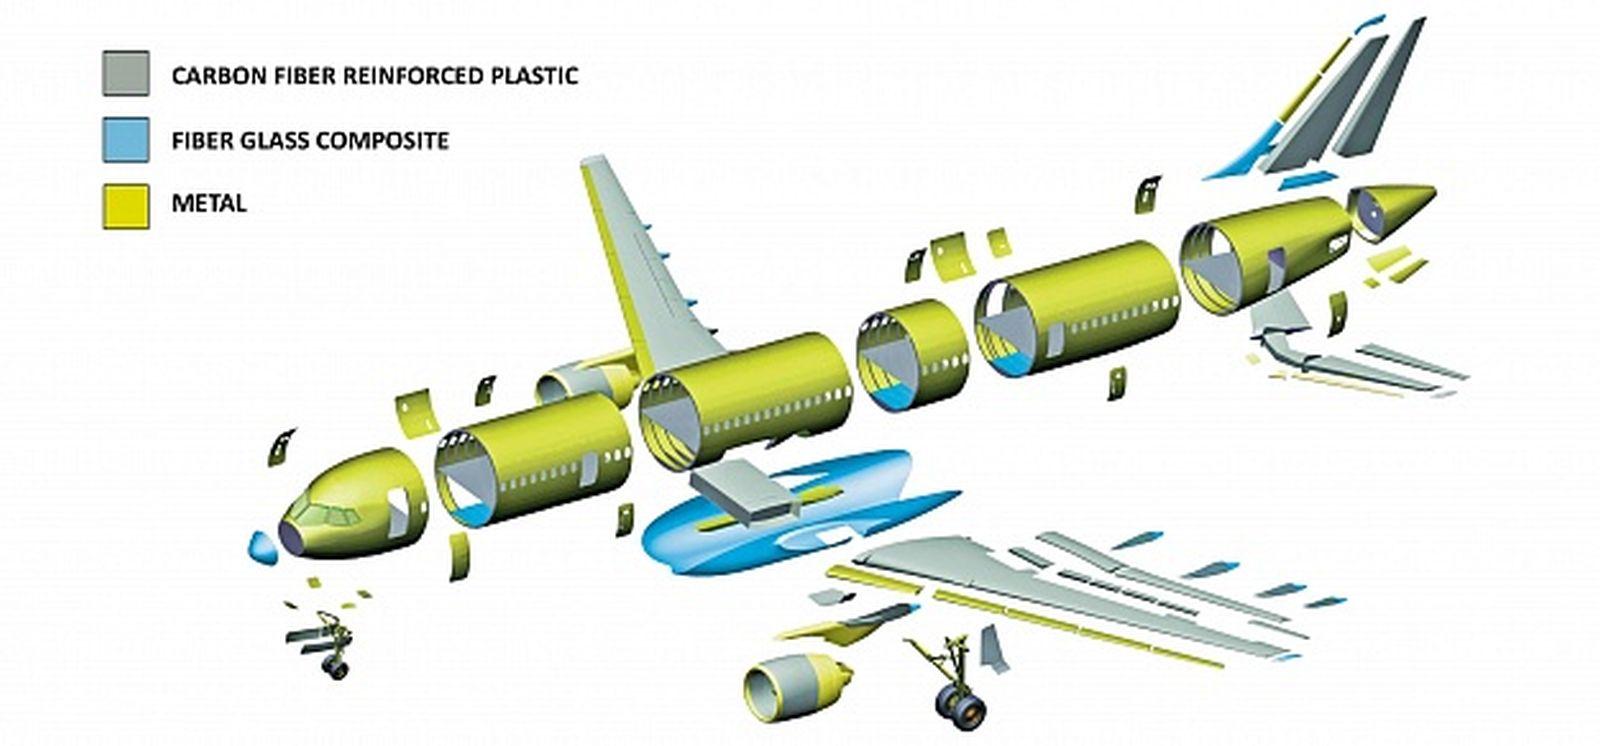 Military And Commercial Technology Irkut Mc 21 Basler Generator Wiring Diagram Image Worldcdnnet